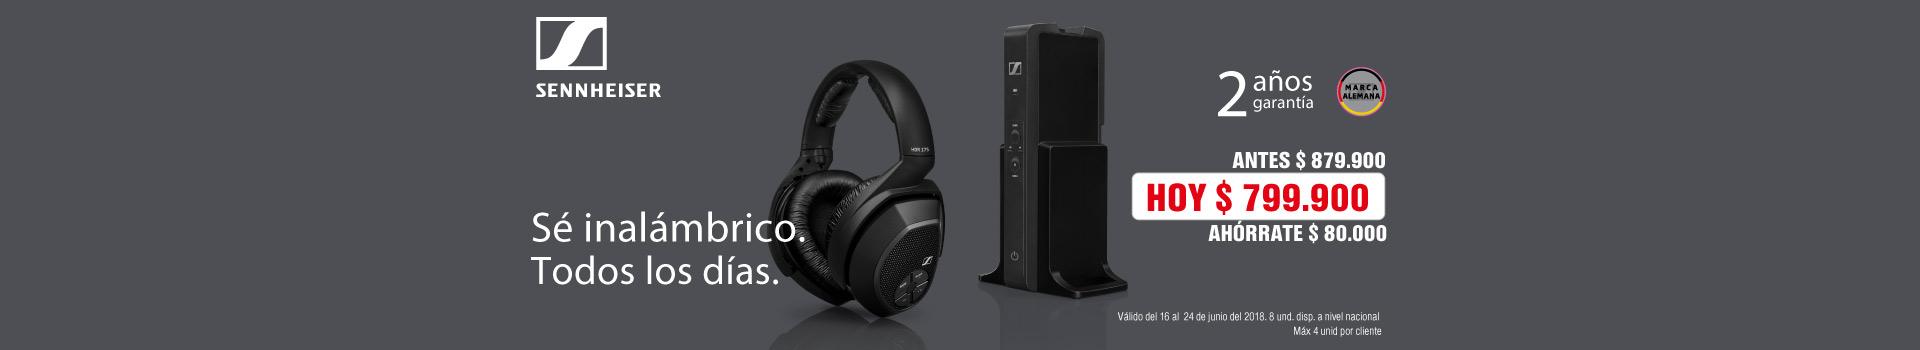 AK-KT-BCAT-3-accesorios-PP---Sennheiser-audifonos-Jun16